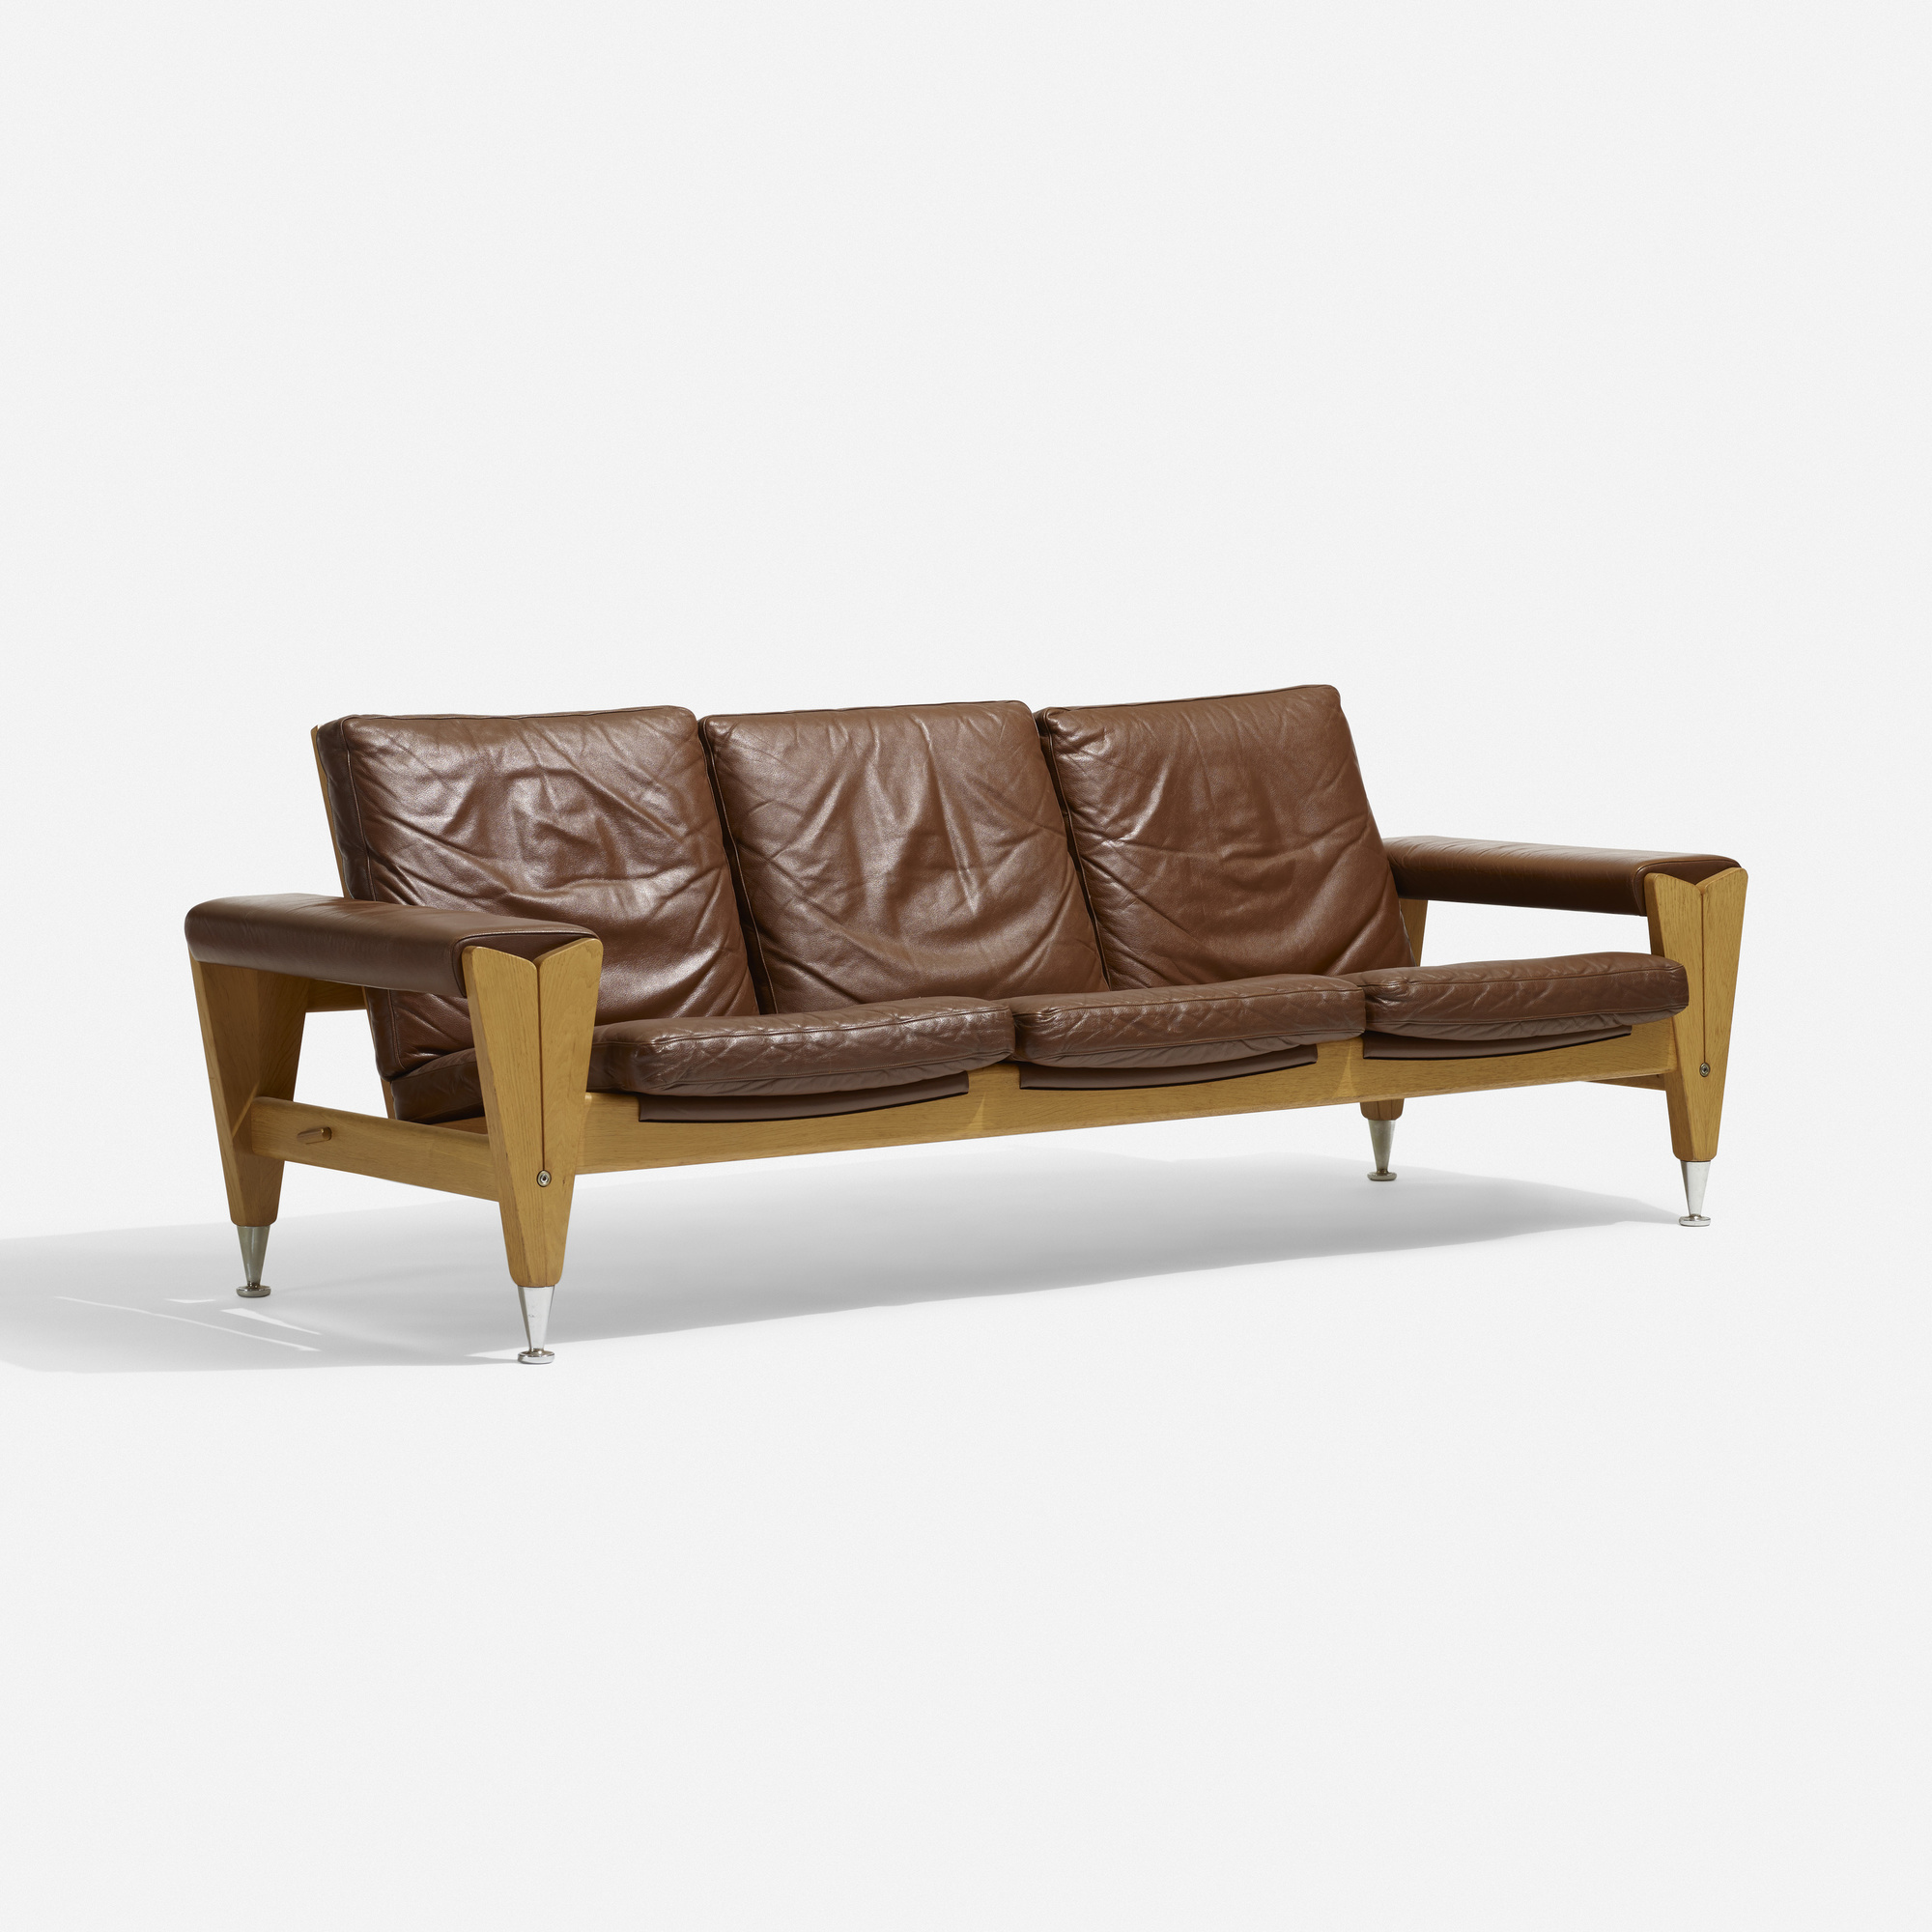 195 Hans J Wegner Sofa Model Ge 500 Scandinavian Design 26